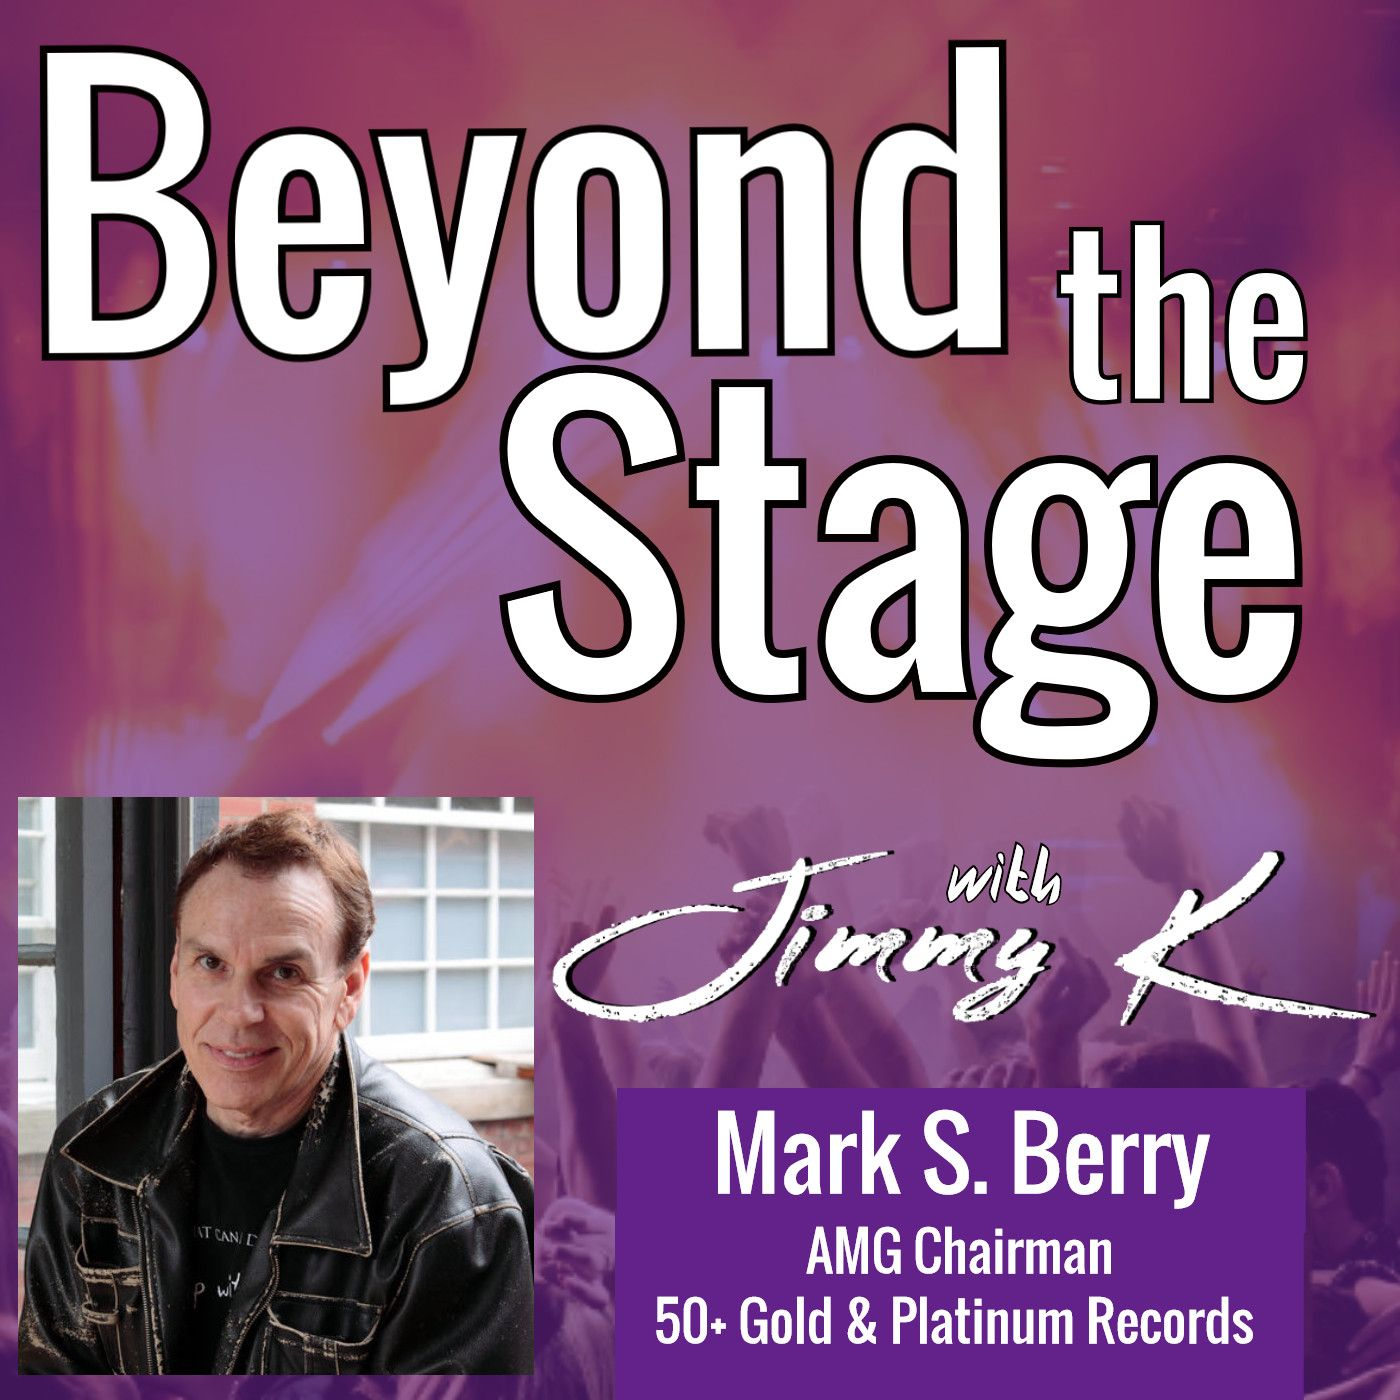 Episode 01: Mark S. Berry